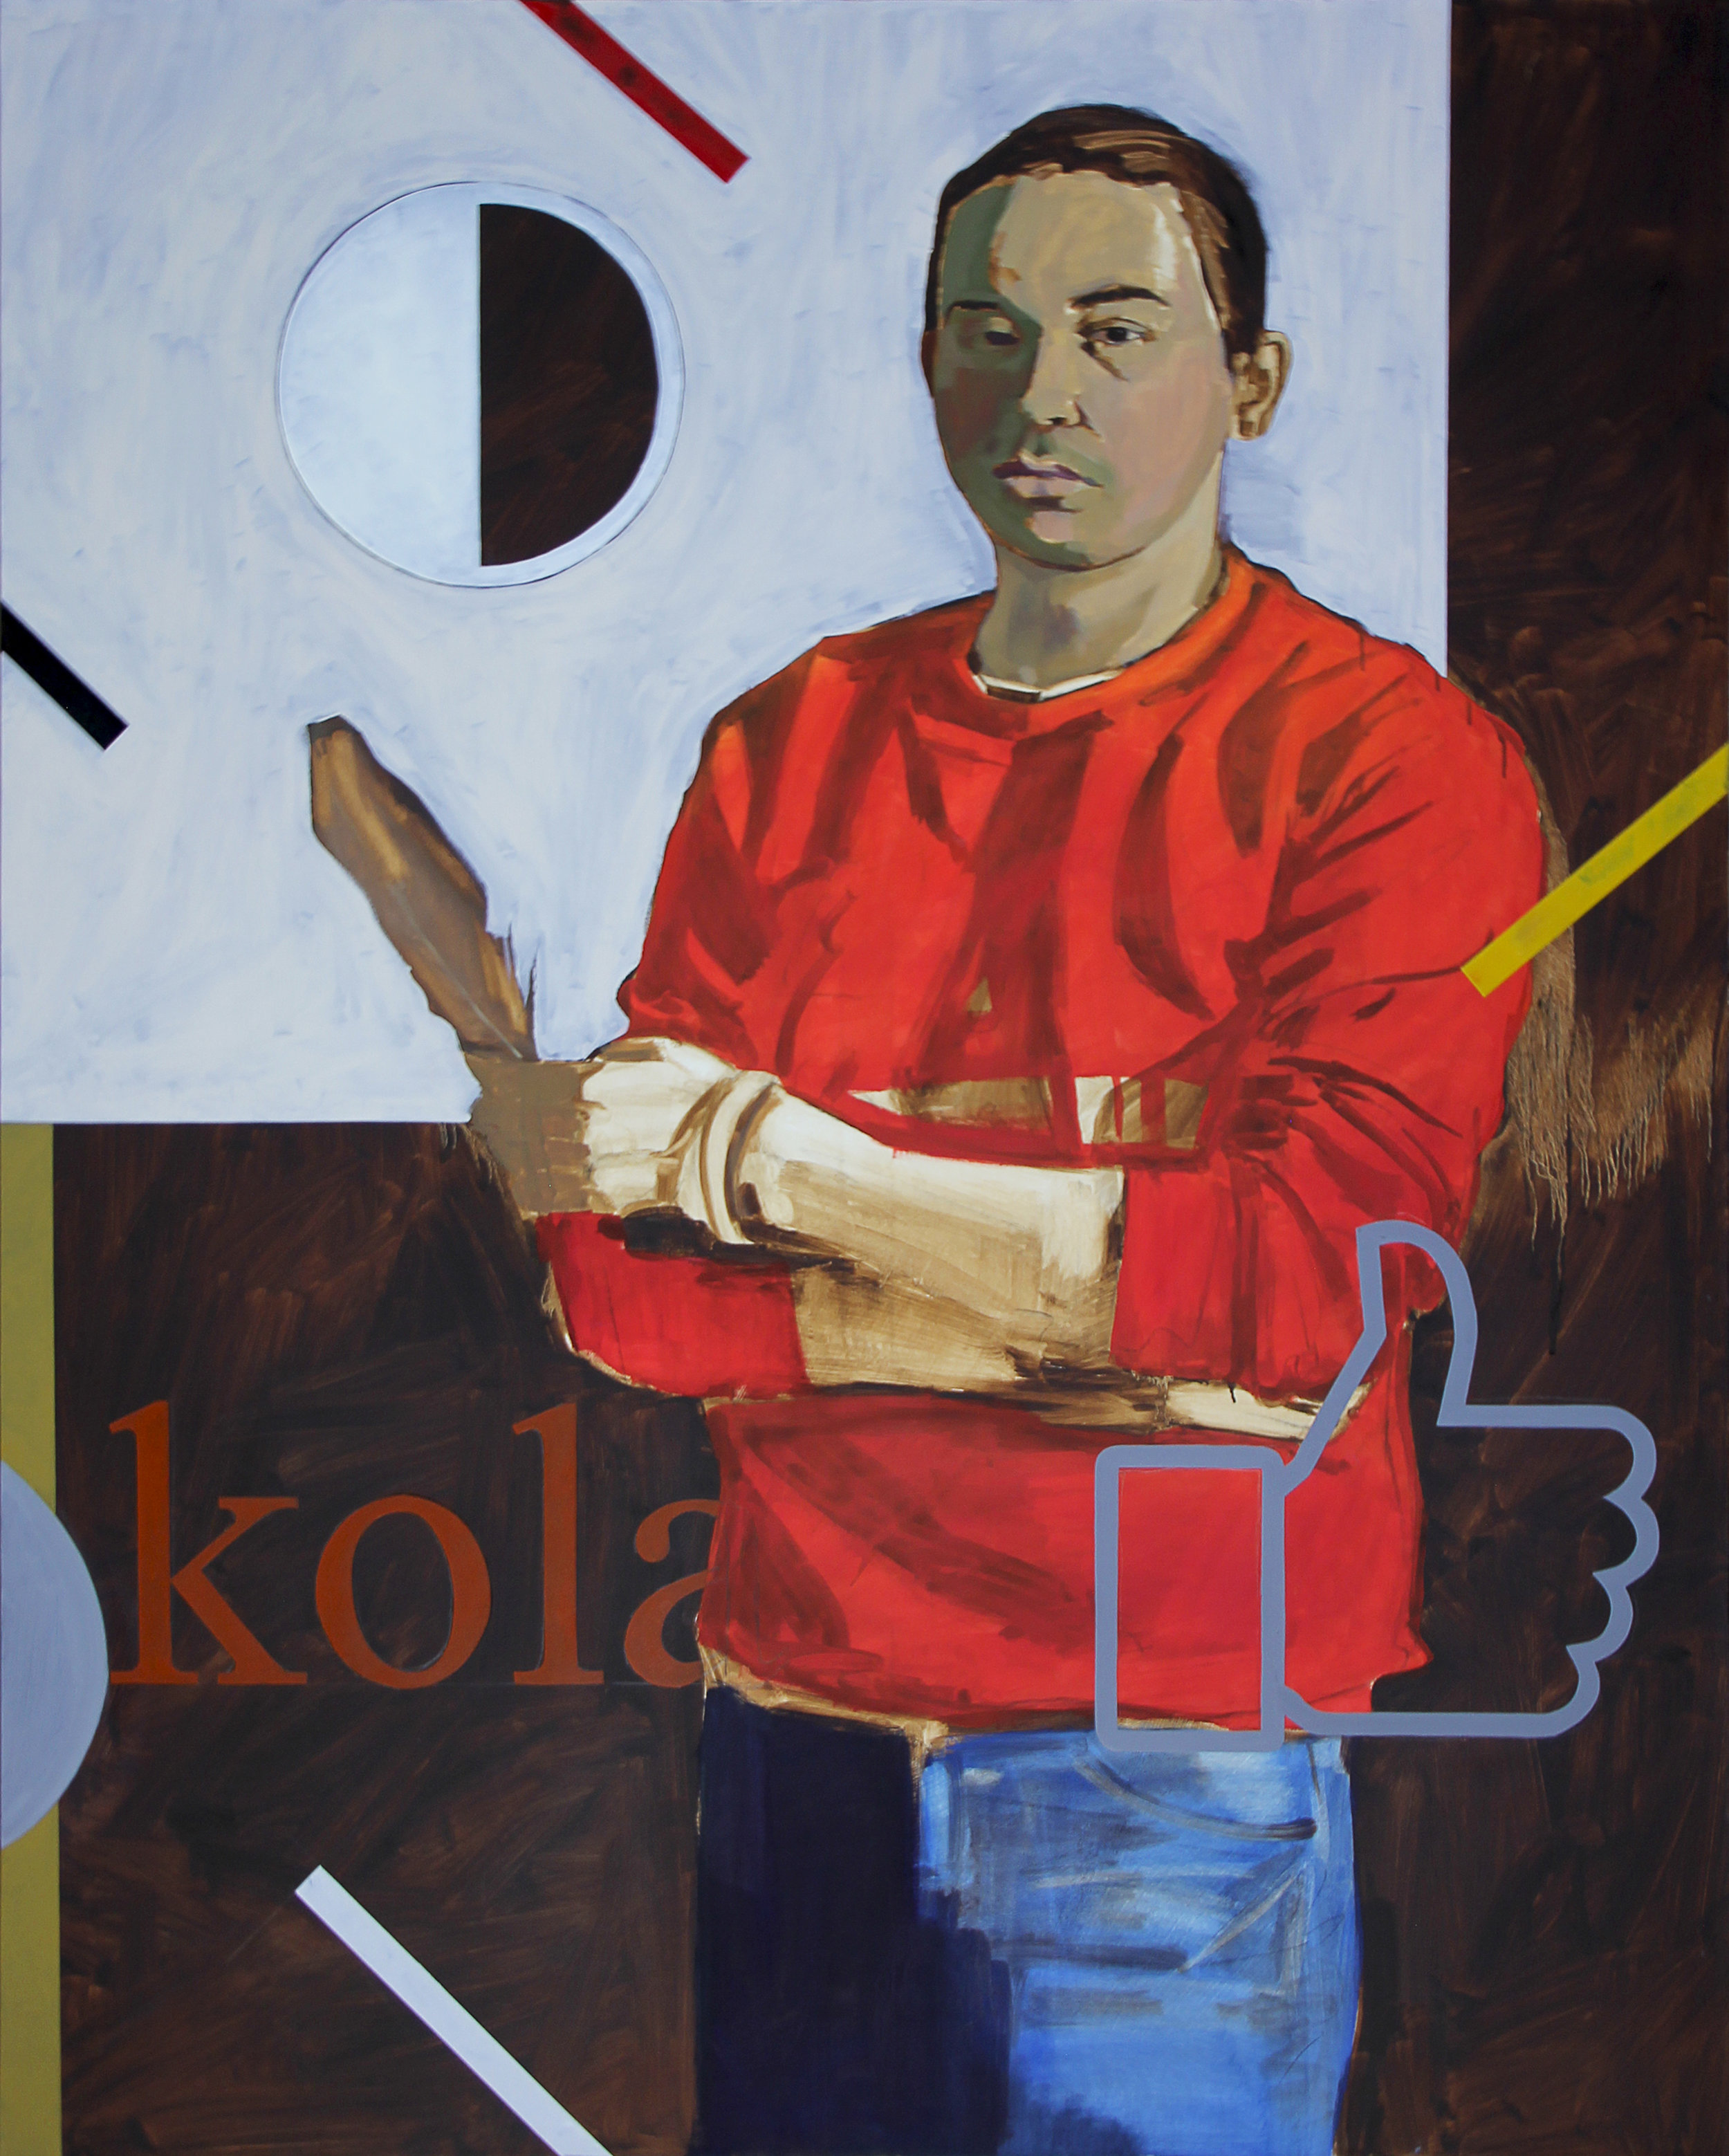 Tate  oil on canvas, 2018